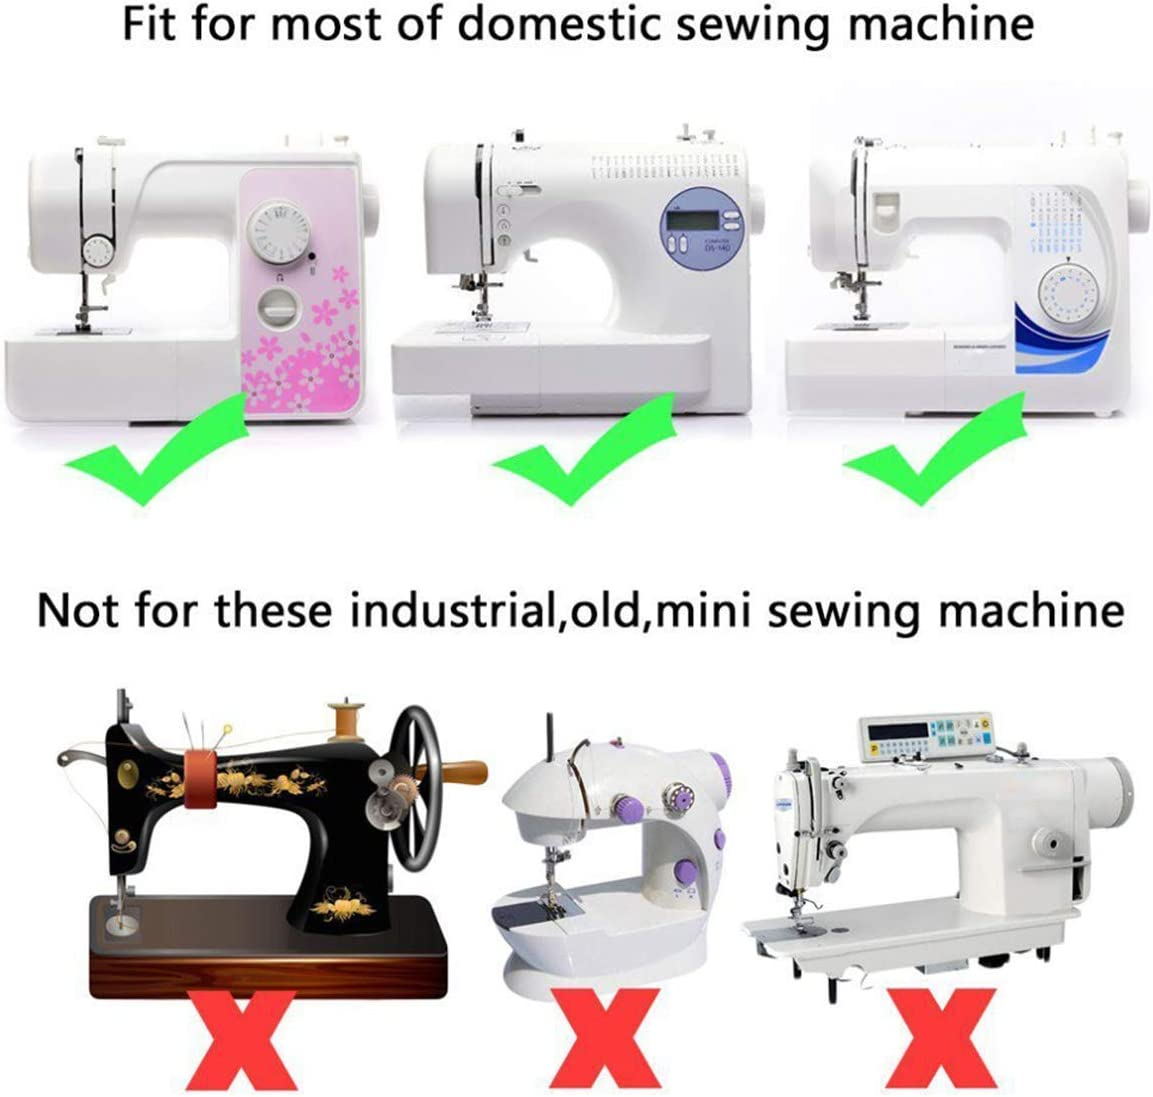 CKPSMS - 1 prensatelas para máquina de coser Overlock Overcast KP ...